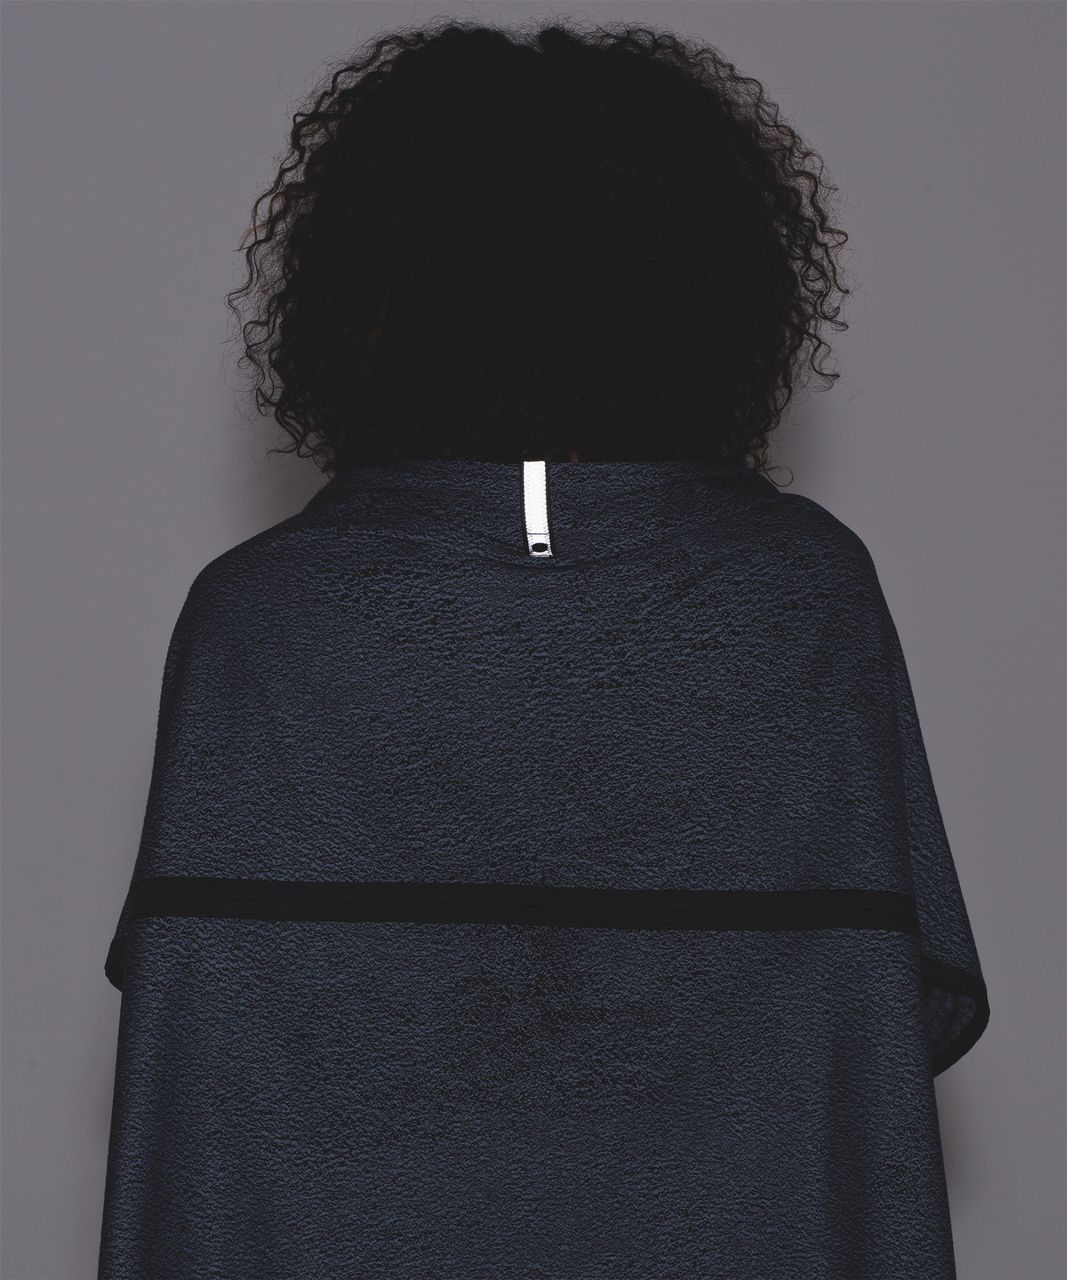 Lululemon Vinyasa Wrap - Running Luon Spray Jacquard Blue Denim Black / Black